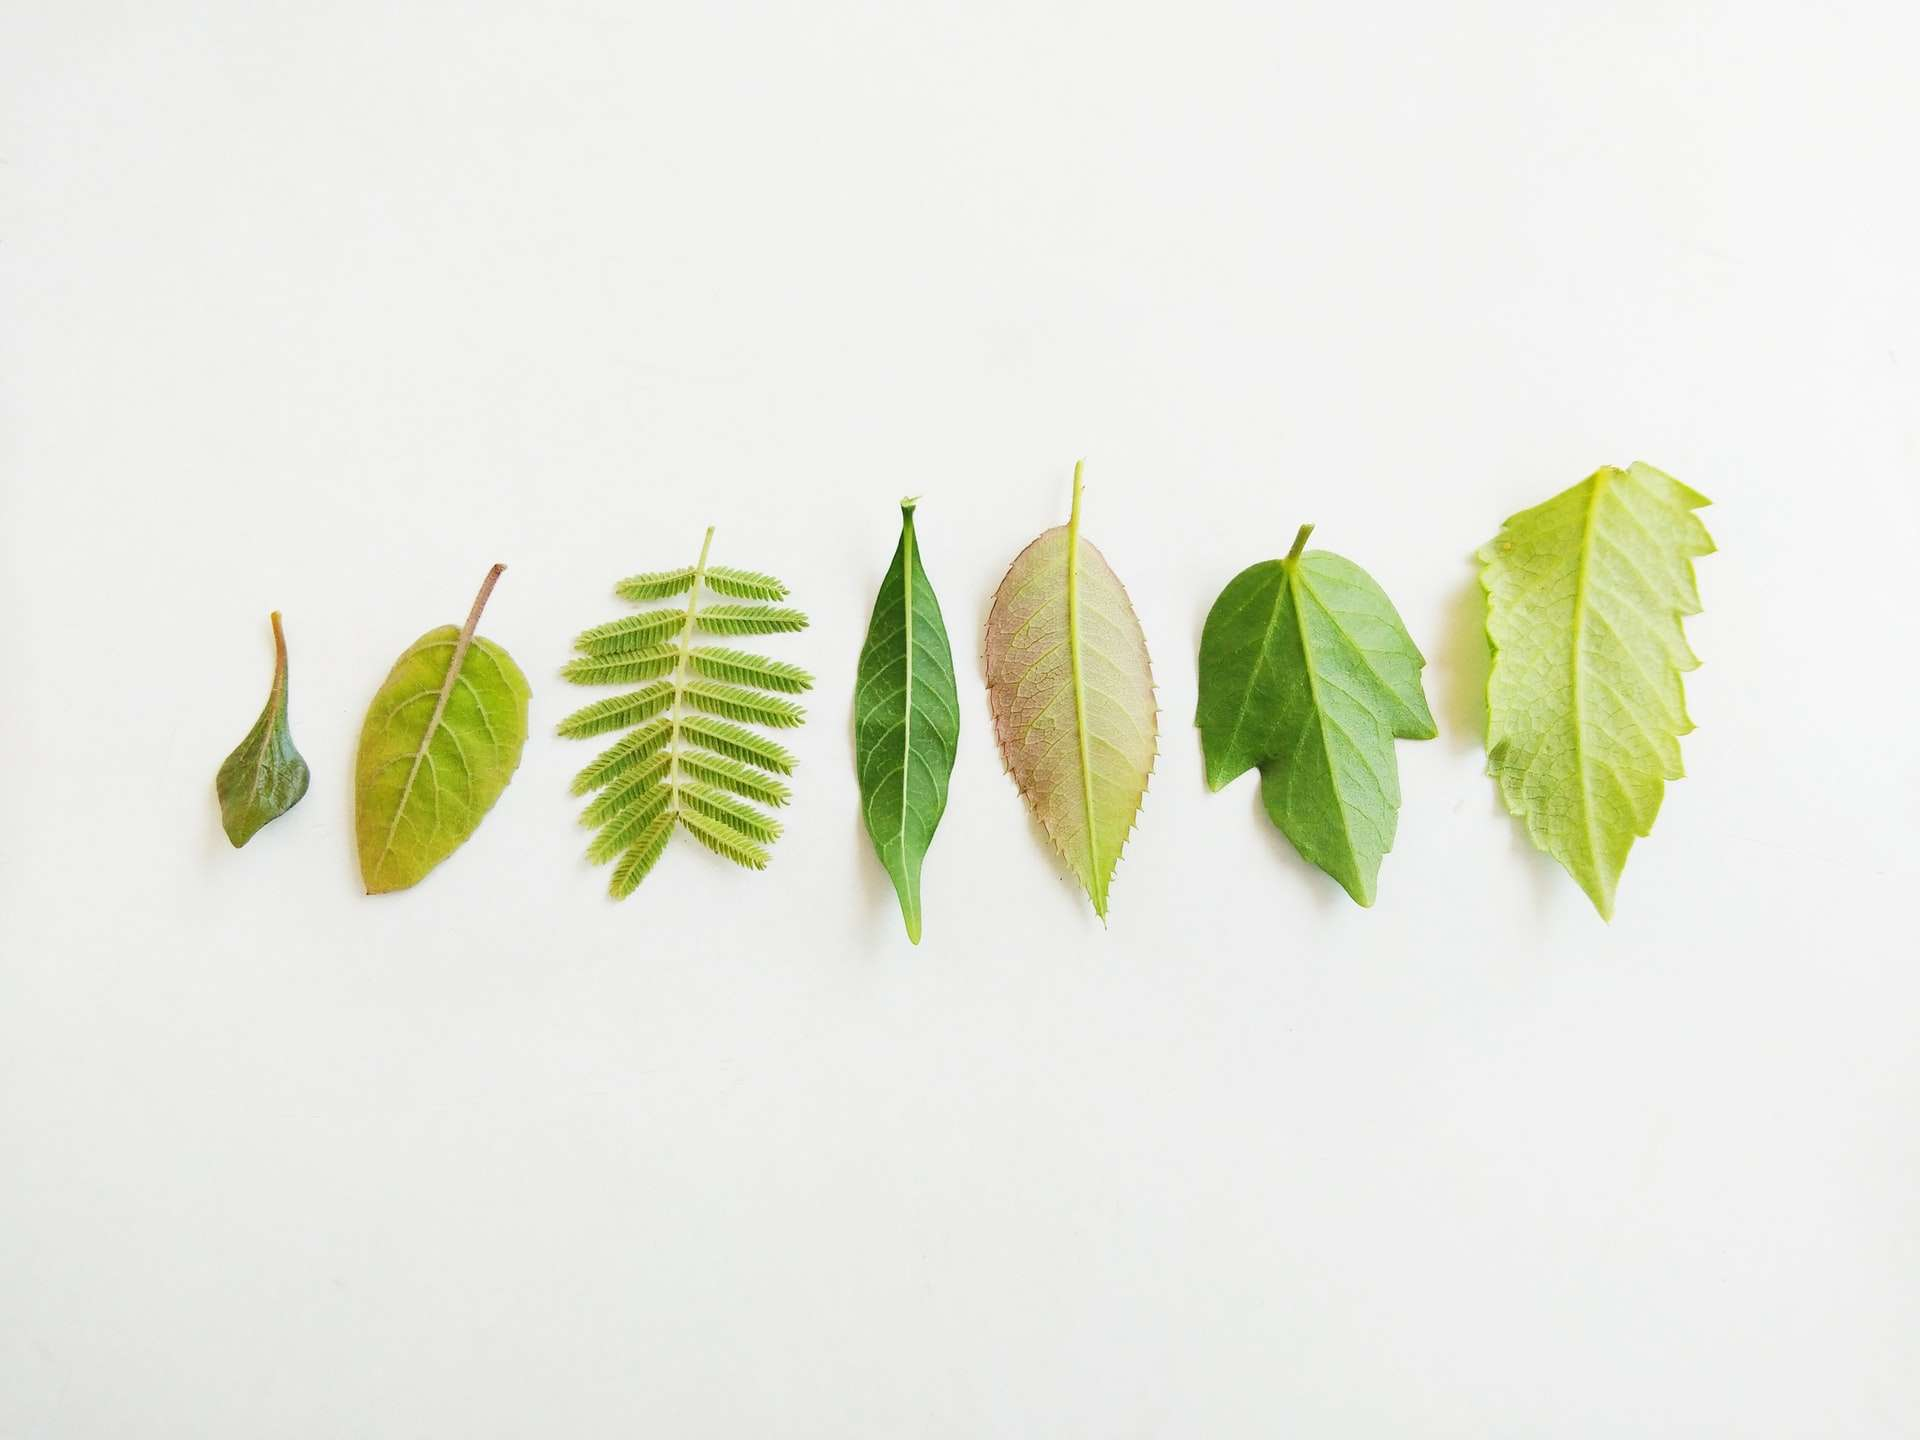 leaf brush illustrator